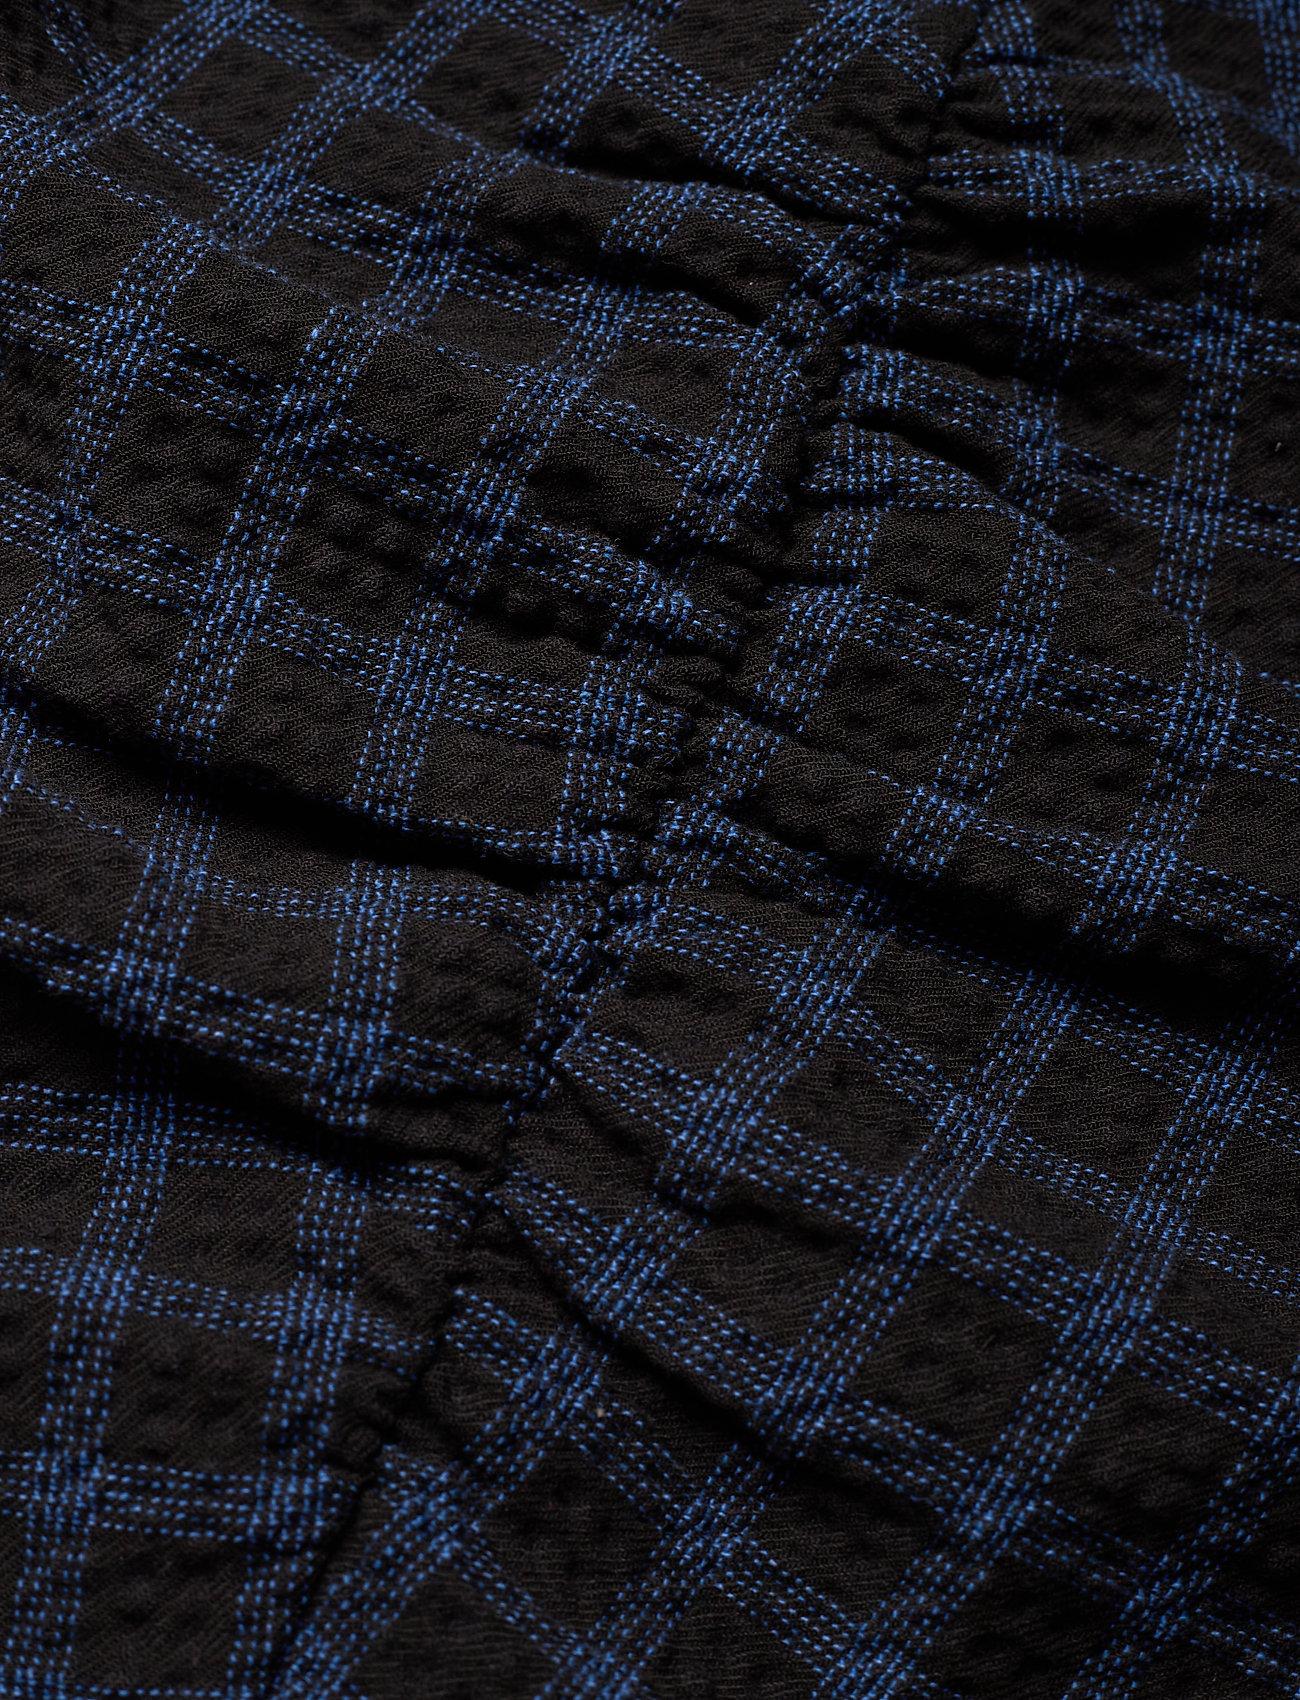 Lydiagz Blouse Ma20 (Blue Check) (139 €) - Gestuz bIH4c